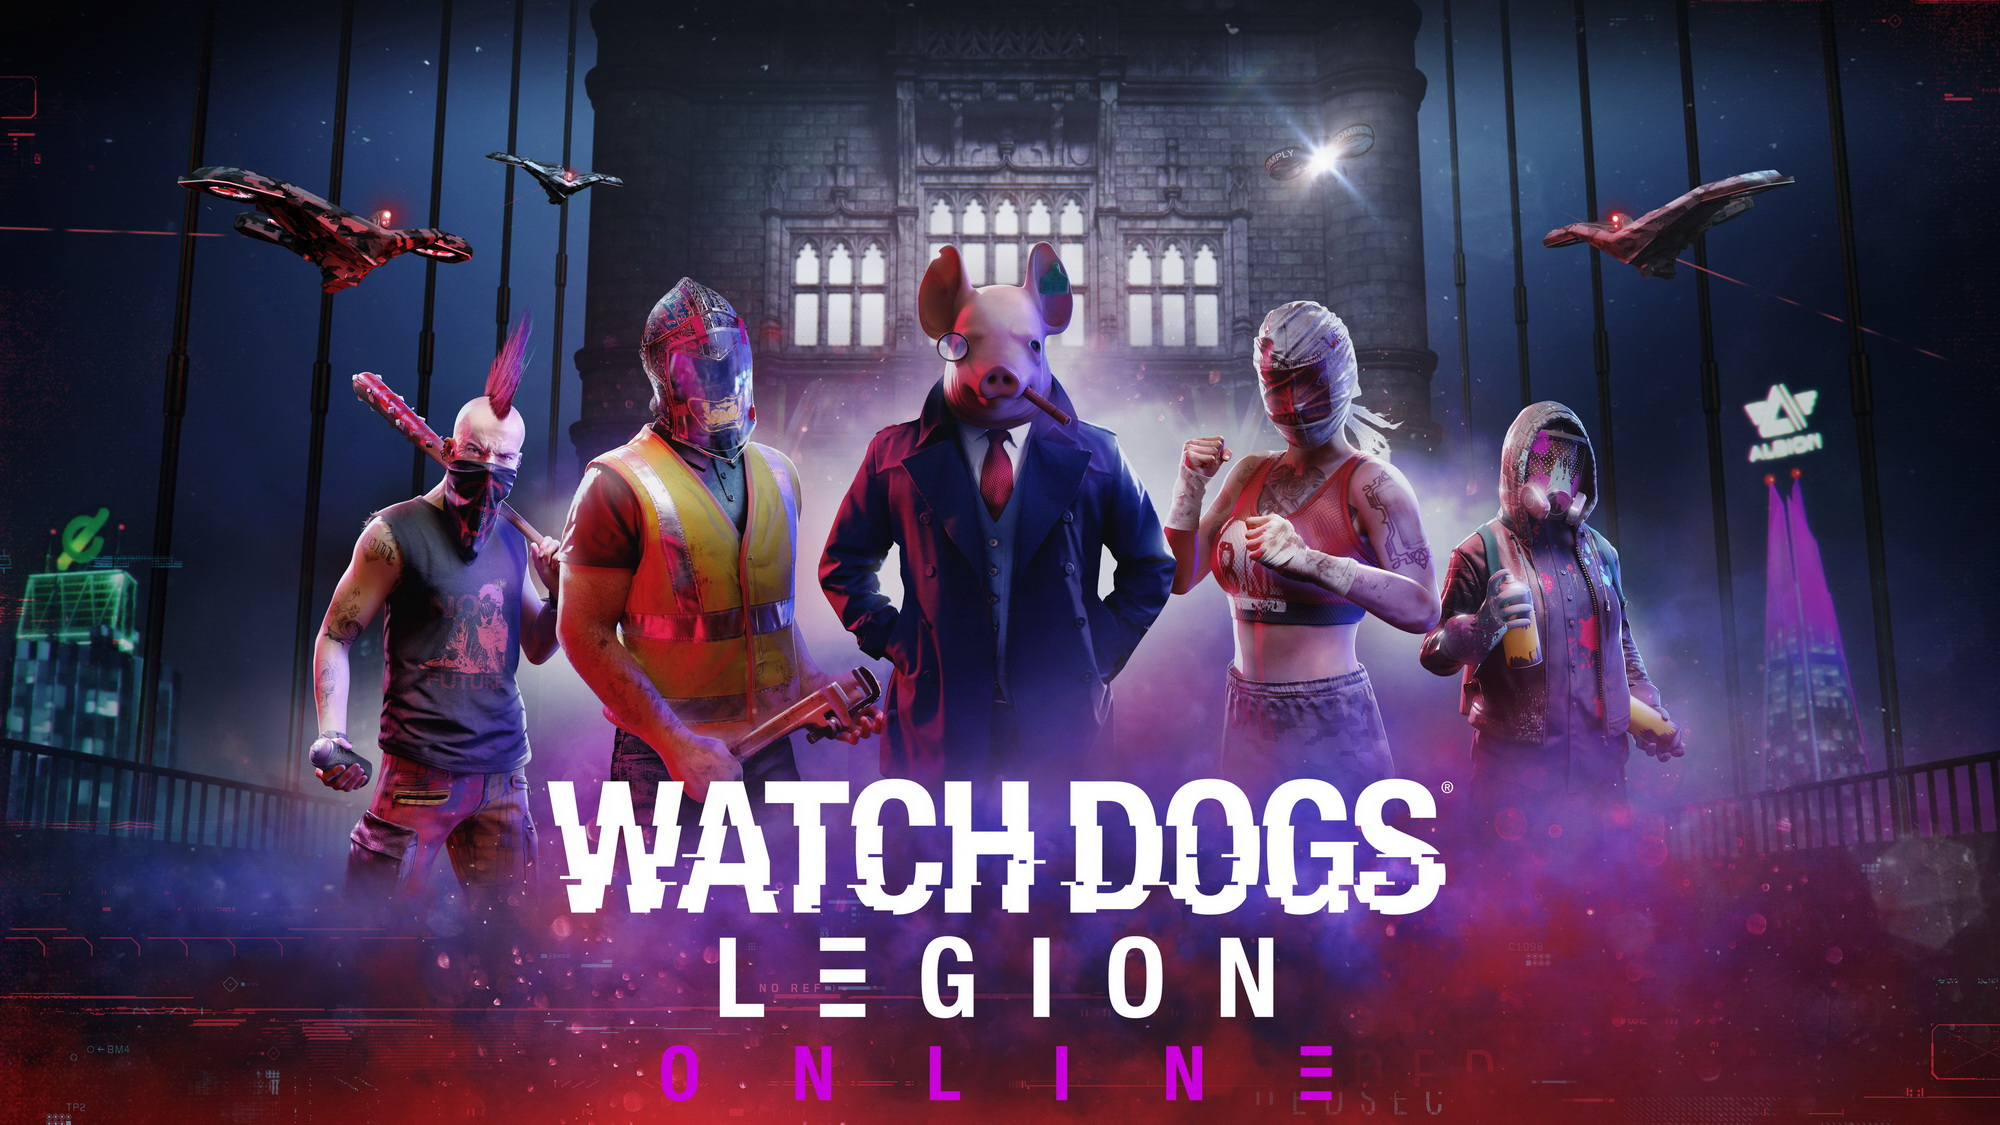 Watchdogs Legion Online mode